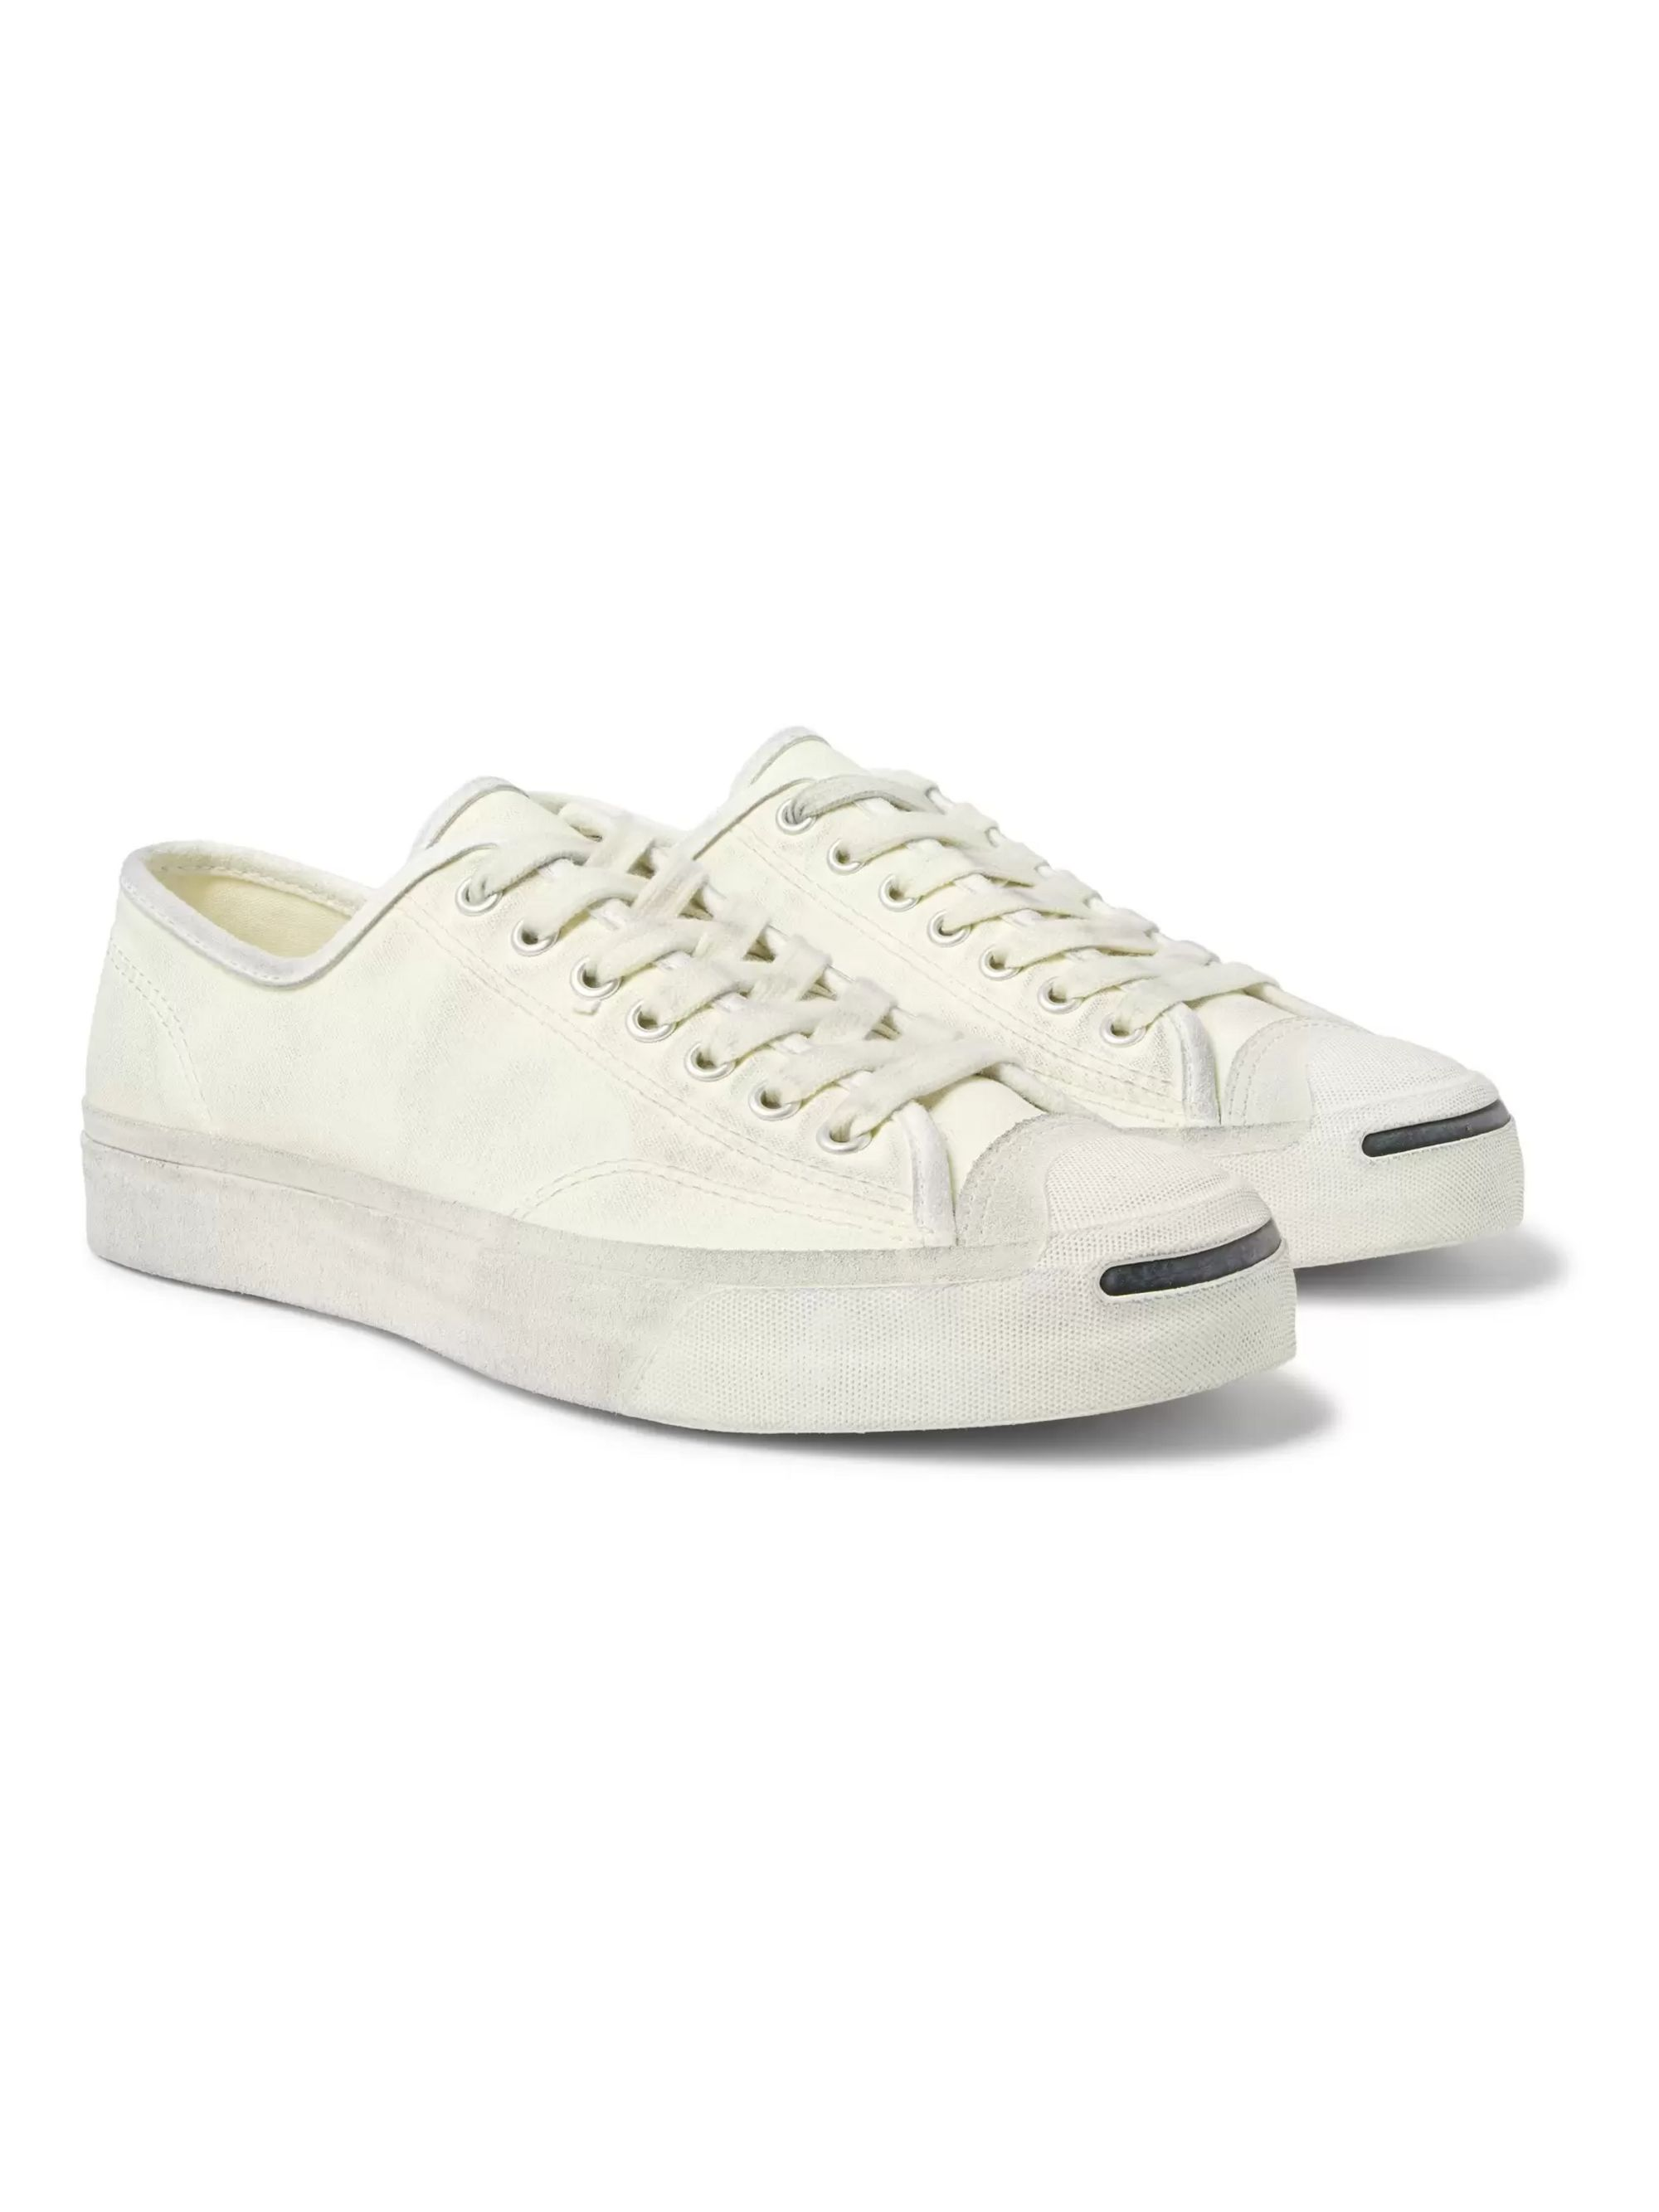 converse canvas white